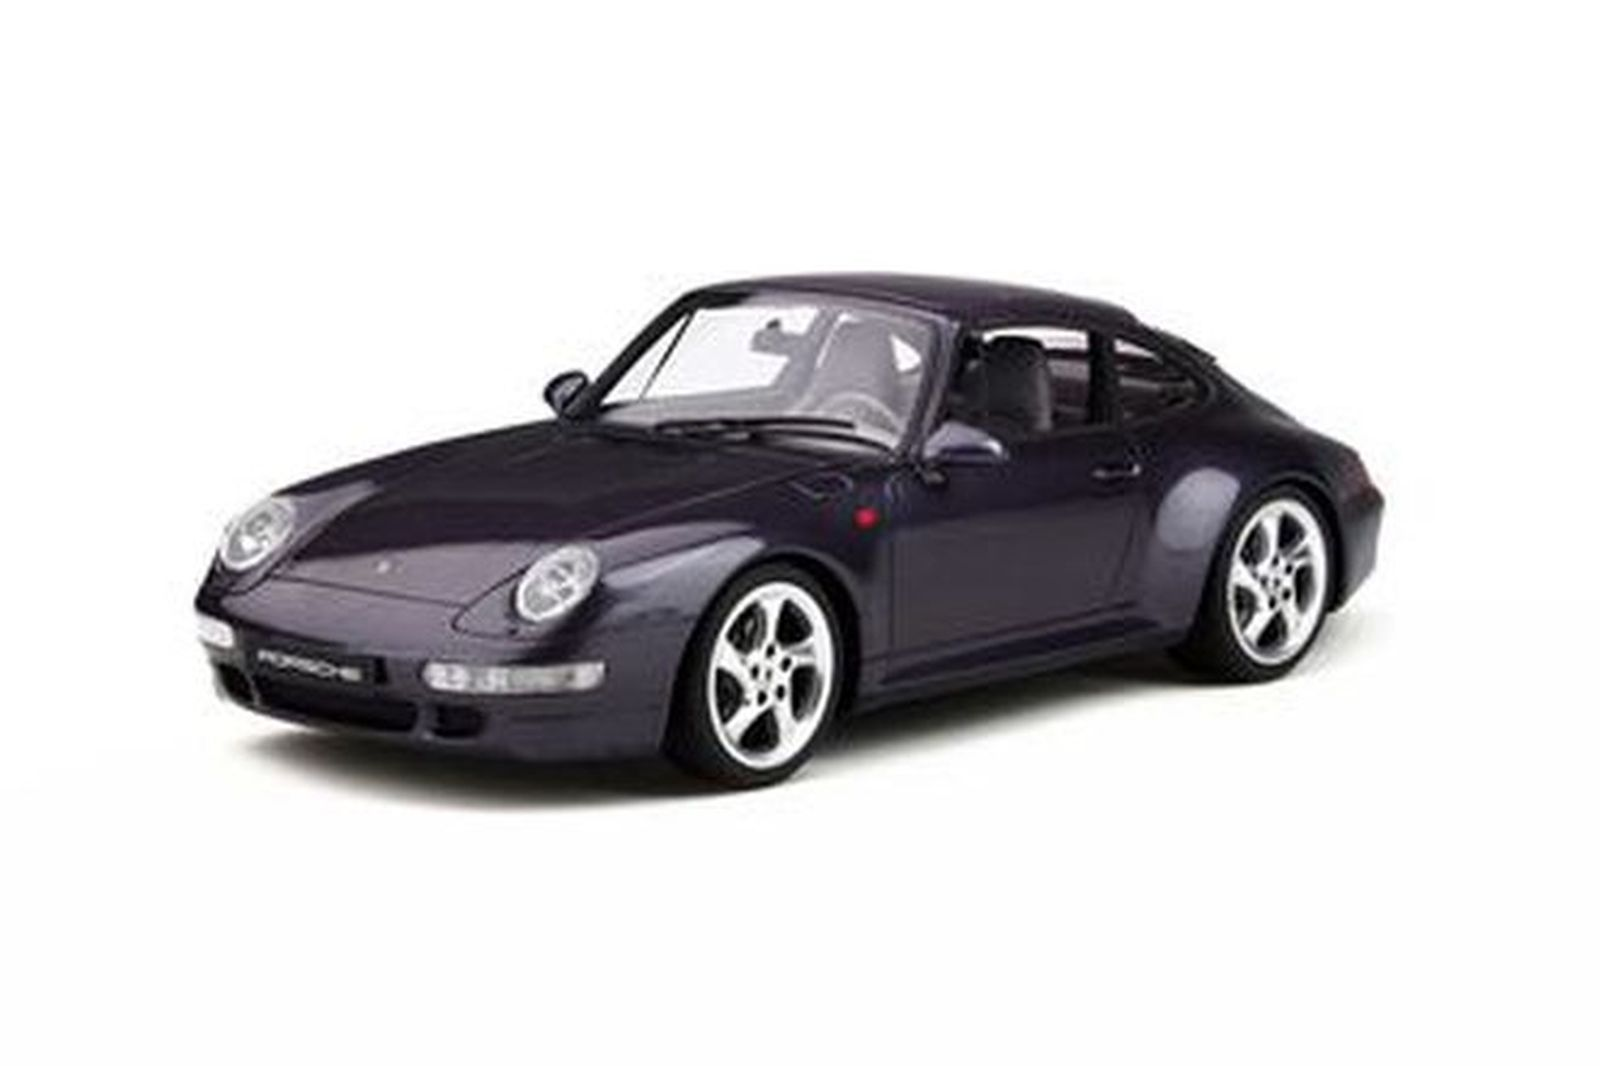 PORSCHE 911 933 CARRERA S